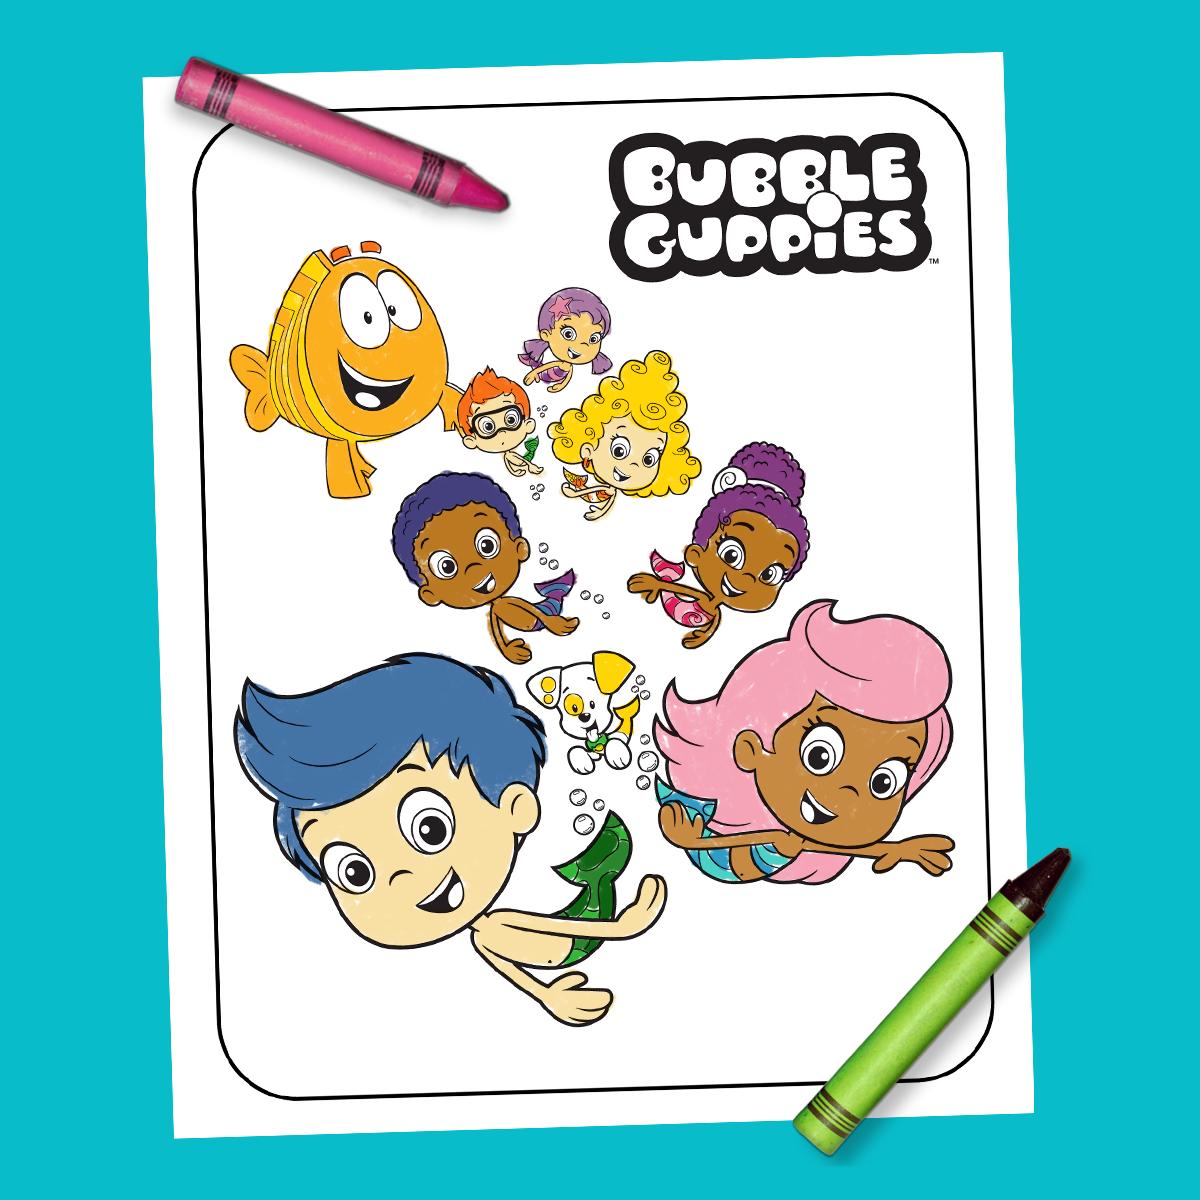 Bubble Guppies Coloring Sheet Bubble Guppies Coloring Sheets Bubbles